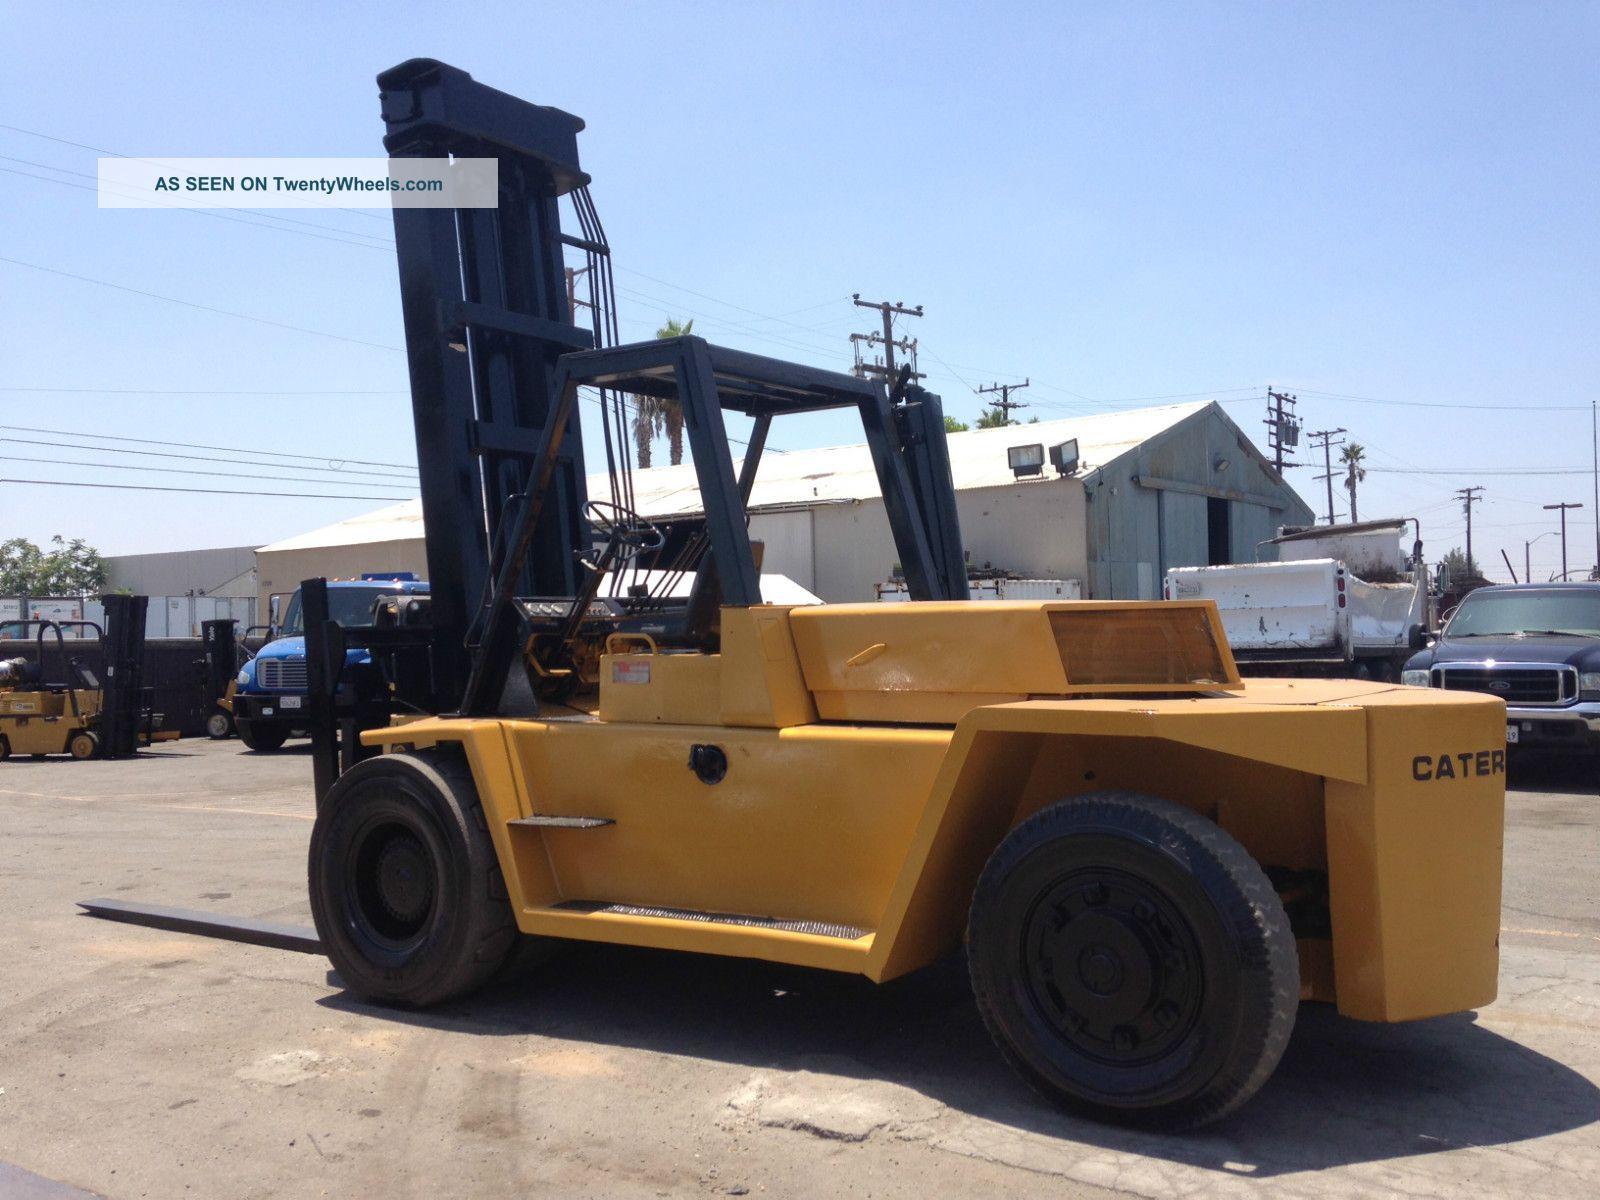 Four Way Side Loader Forklift Mitsubishi Rbm2025k Series: Caterpillar Forklift 25000 Lbs Capacity Model V250b Diesel